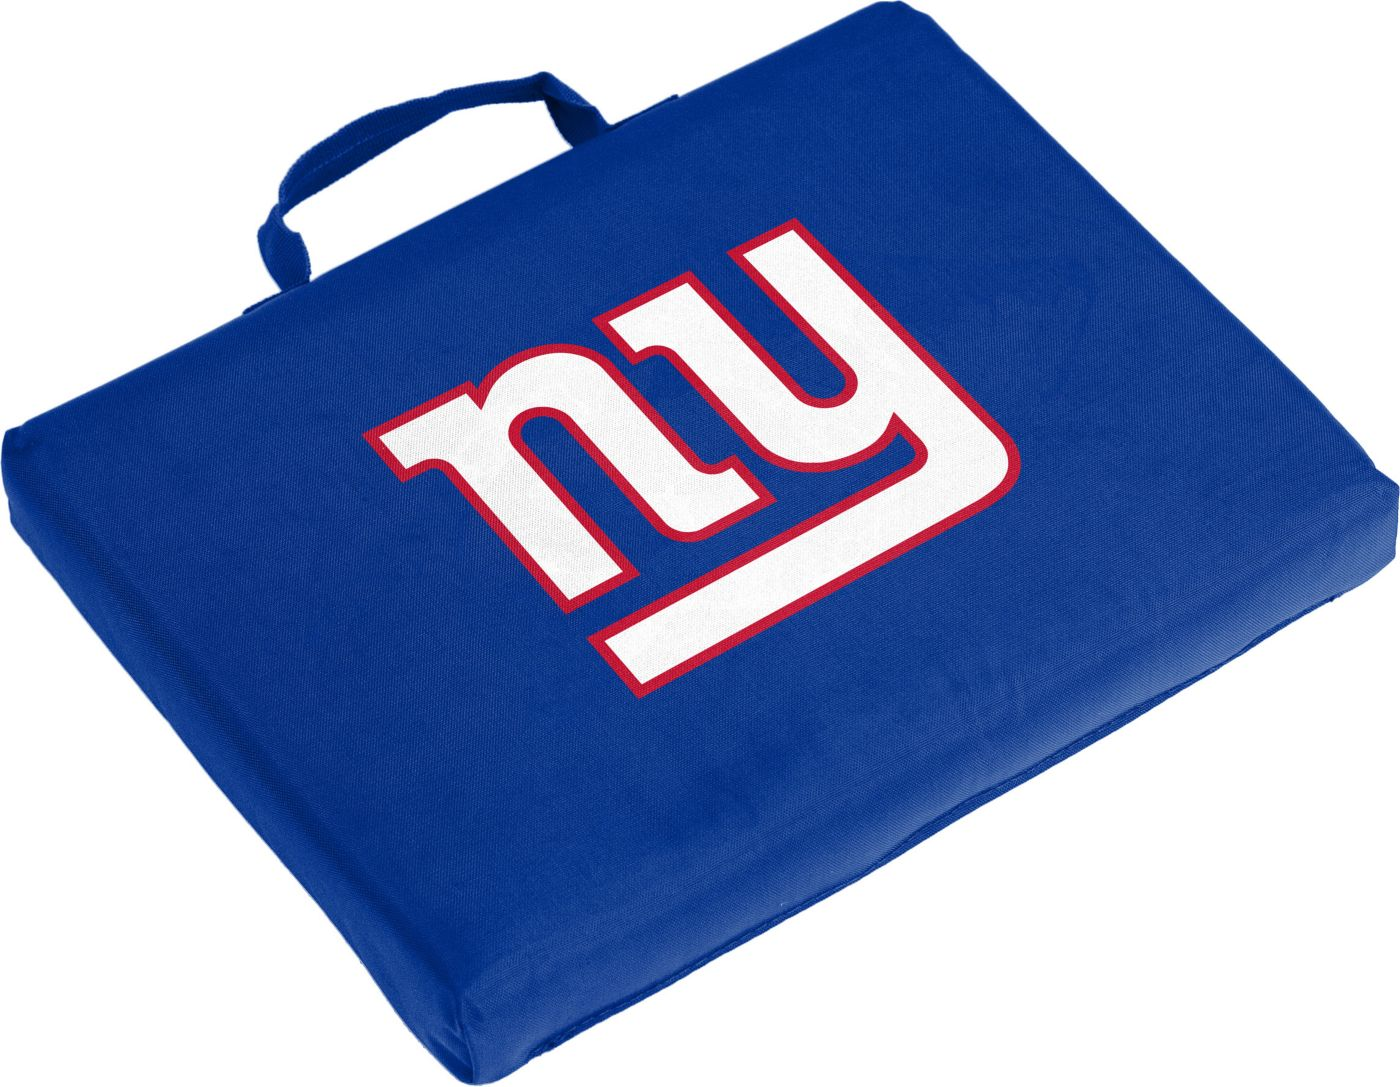 New York Giants Bleacher Seat Cushion